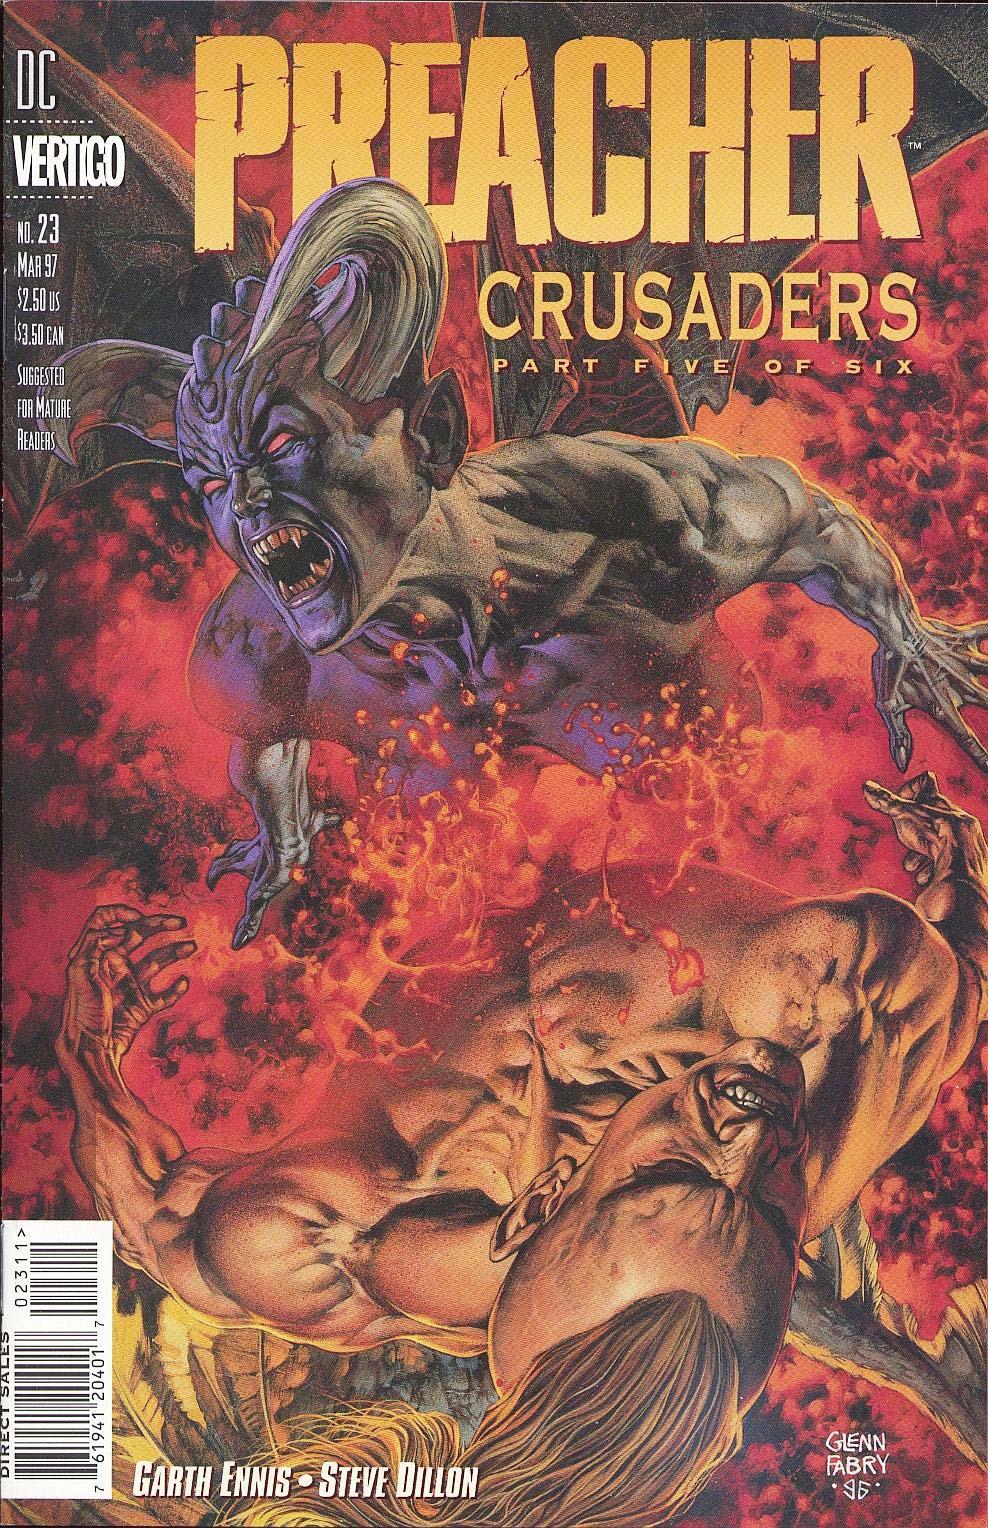 Комиксы Онлайн - Проповедник - # 23 - Страница №1 - Preacher - Preacher # 23